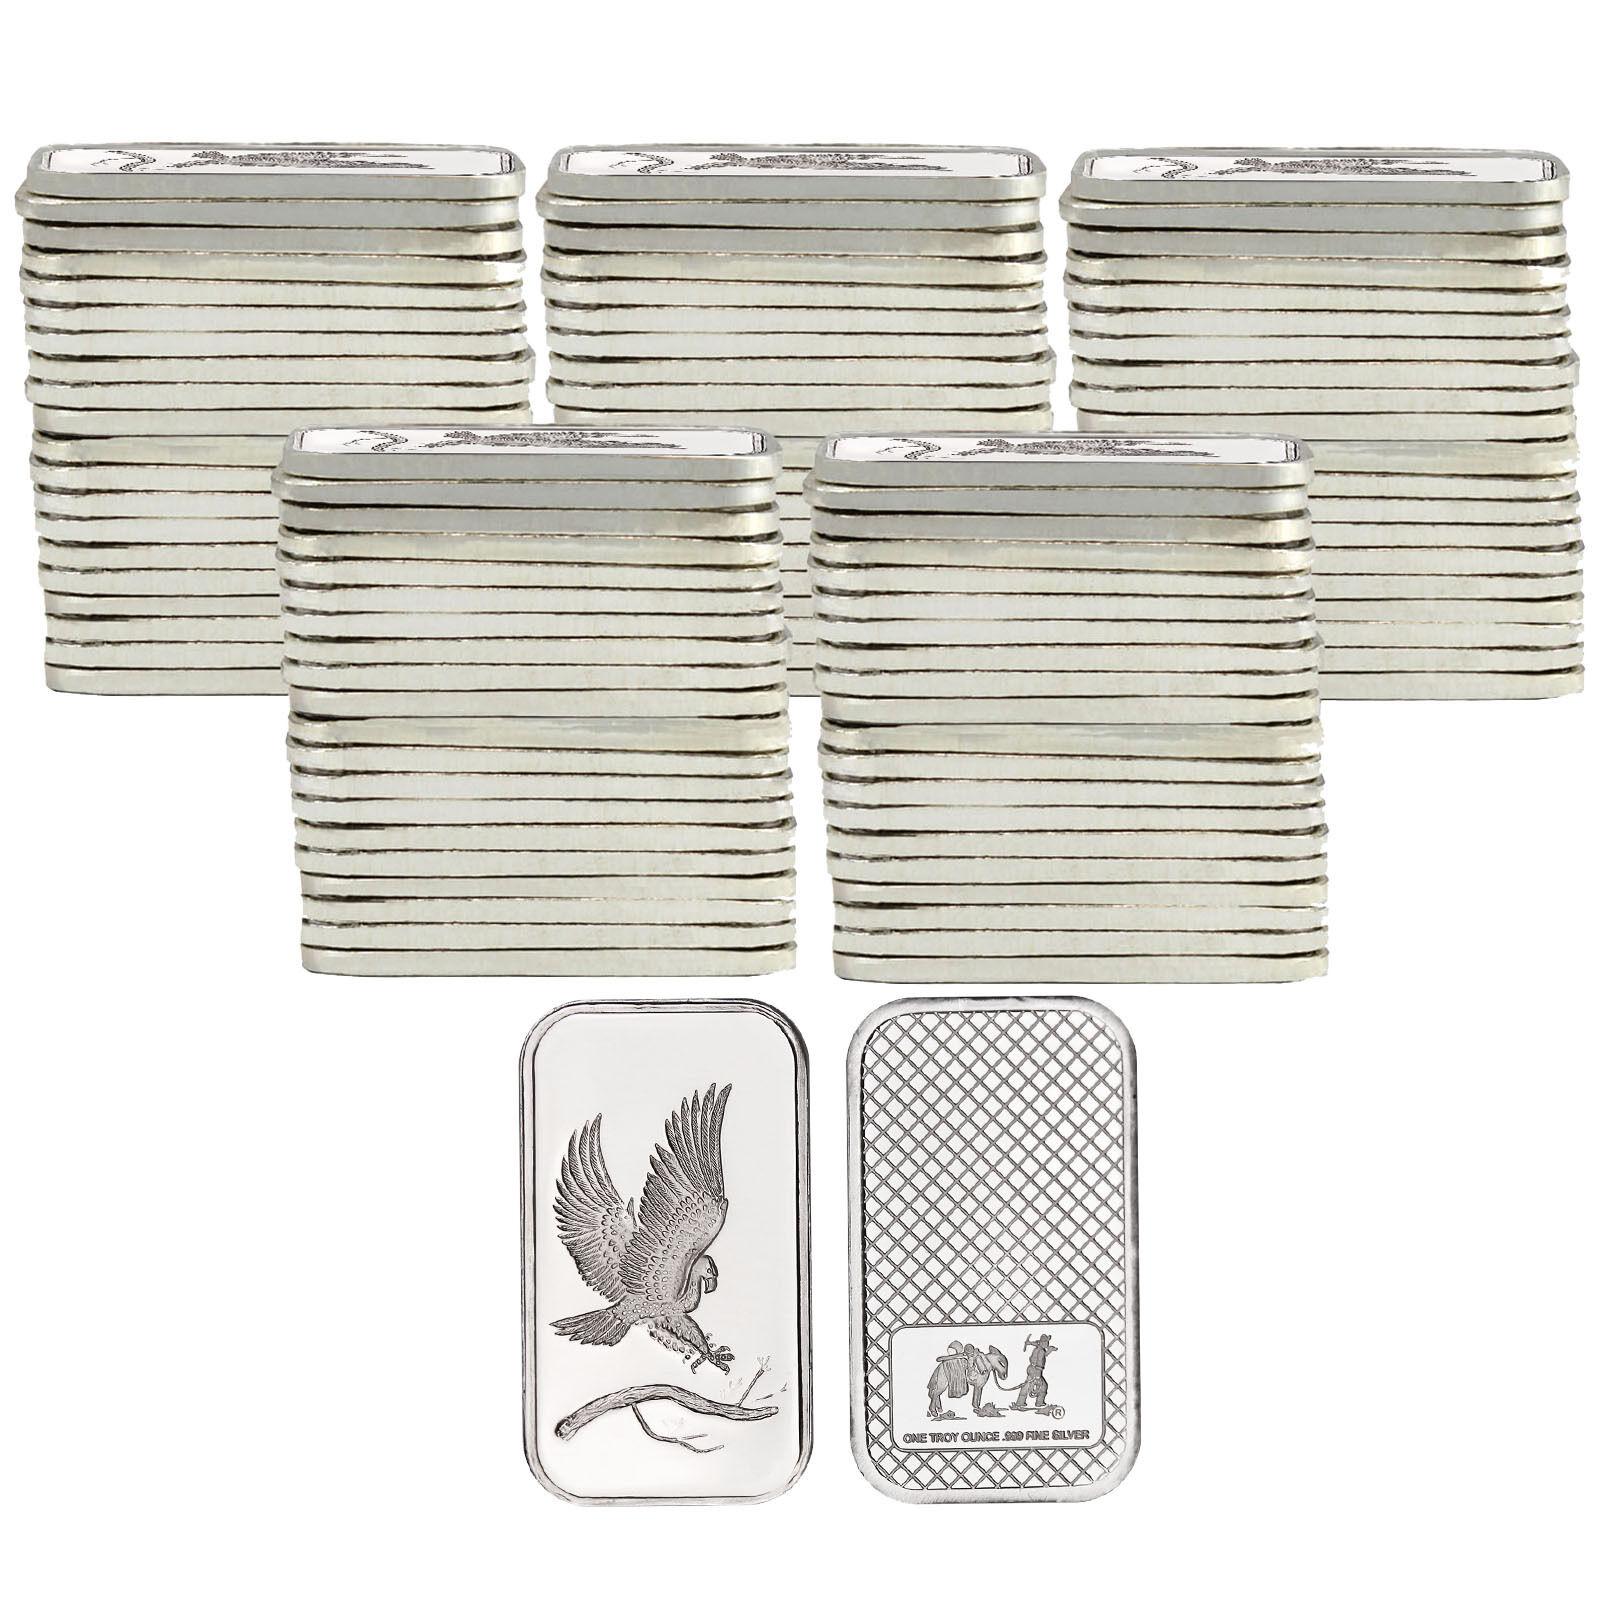 Trademark Bald Eagle 1oz .999 Fine Silver Bars by SilverTowne LOT OF 100